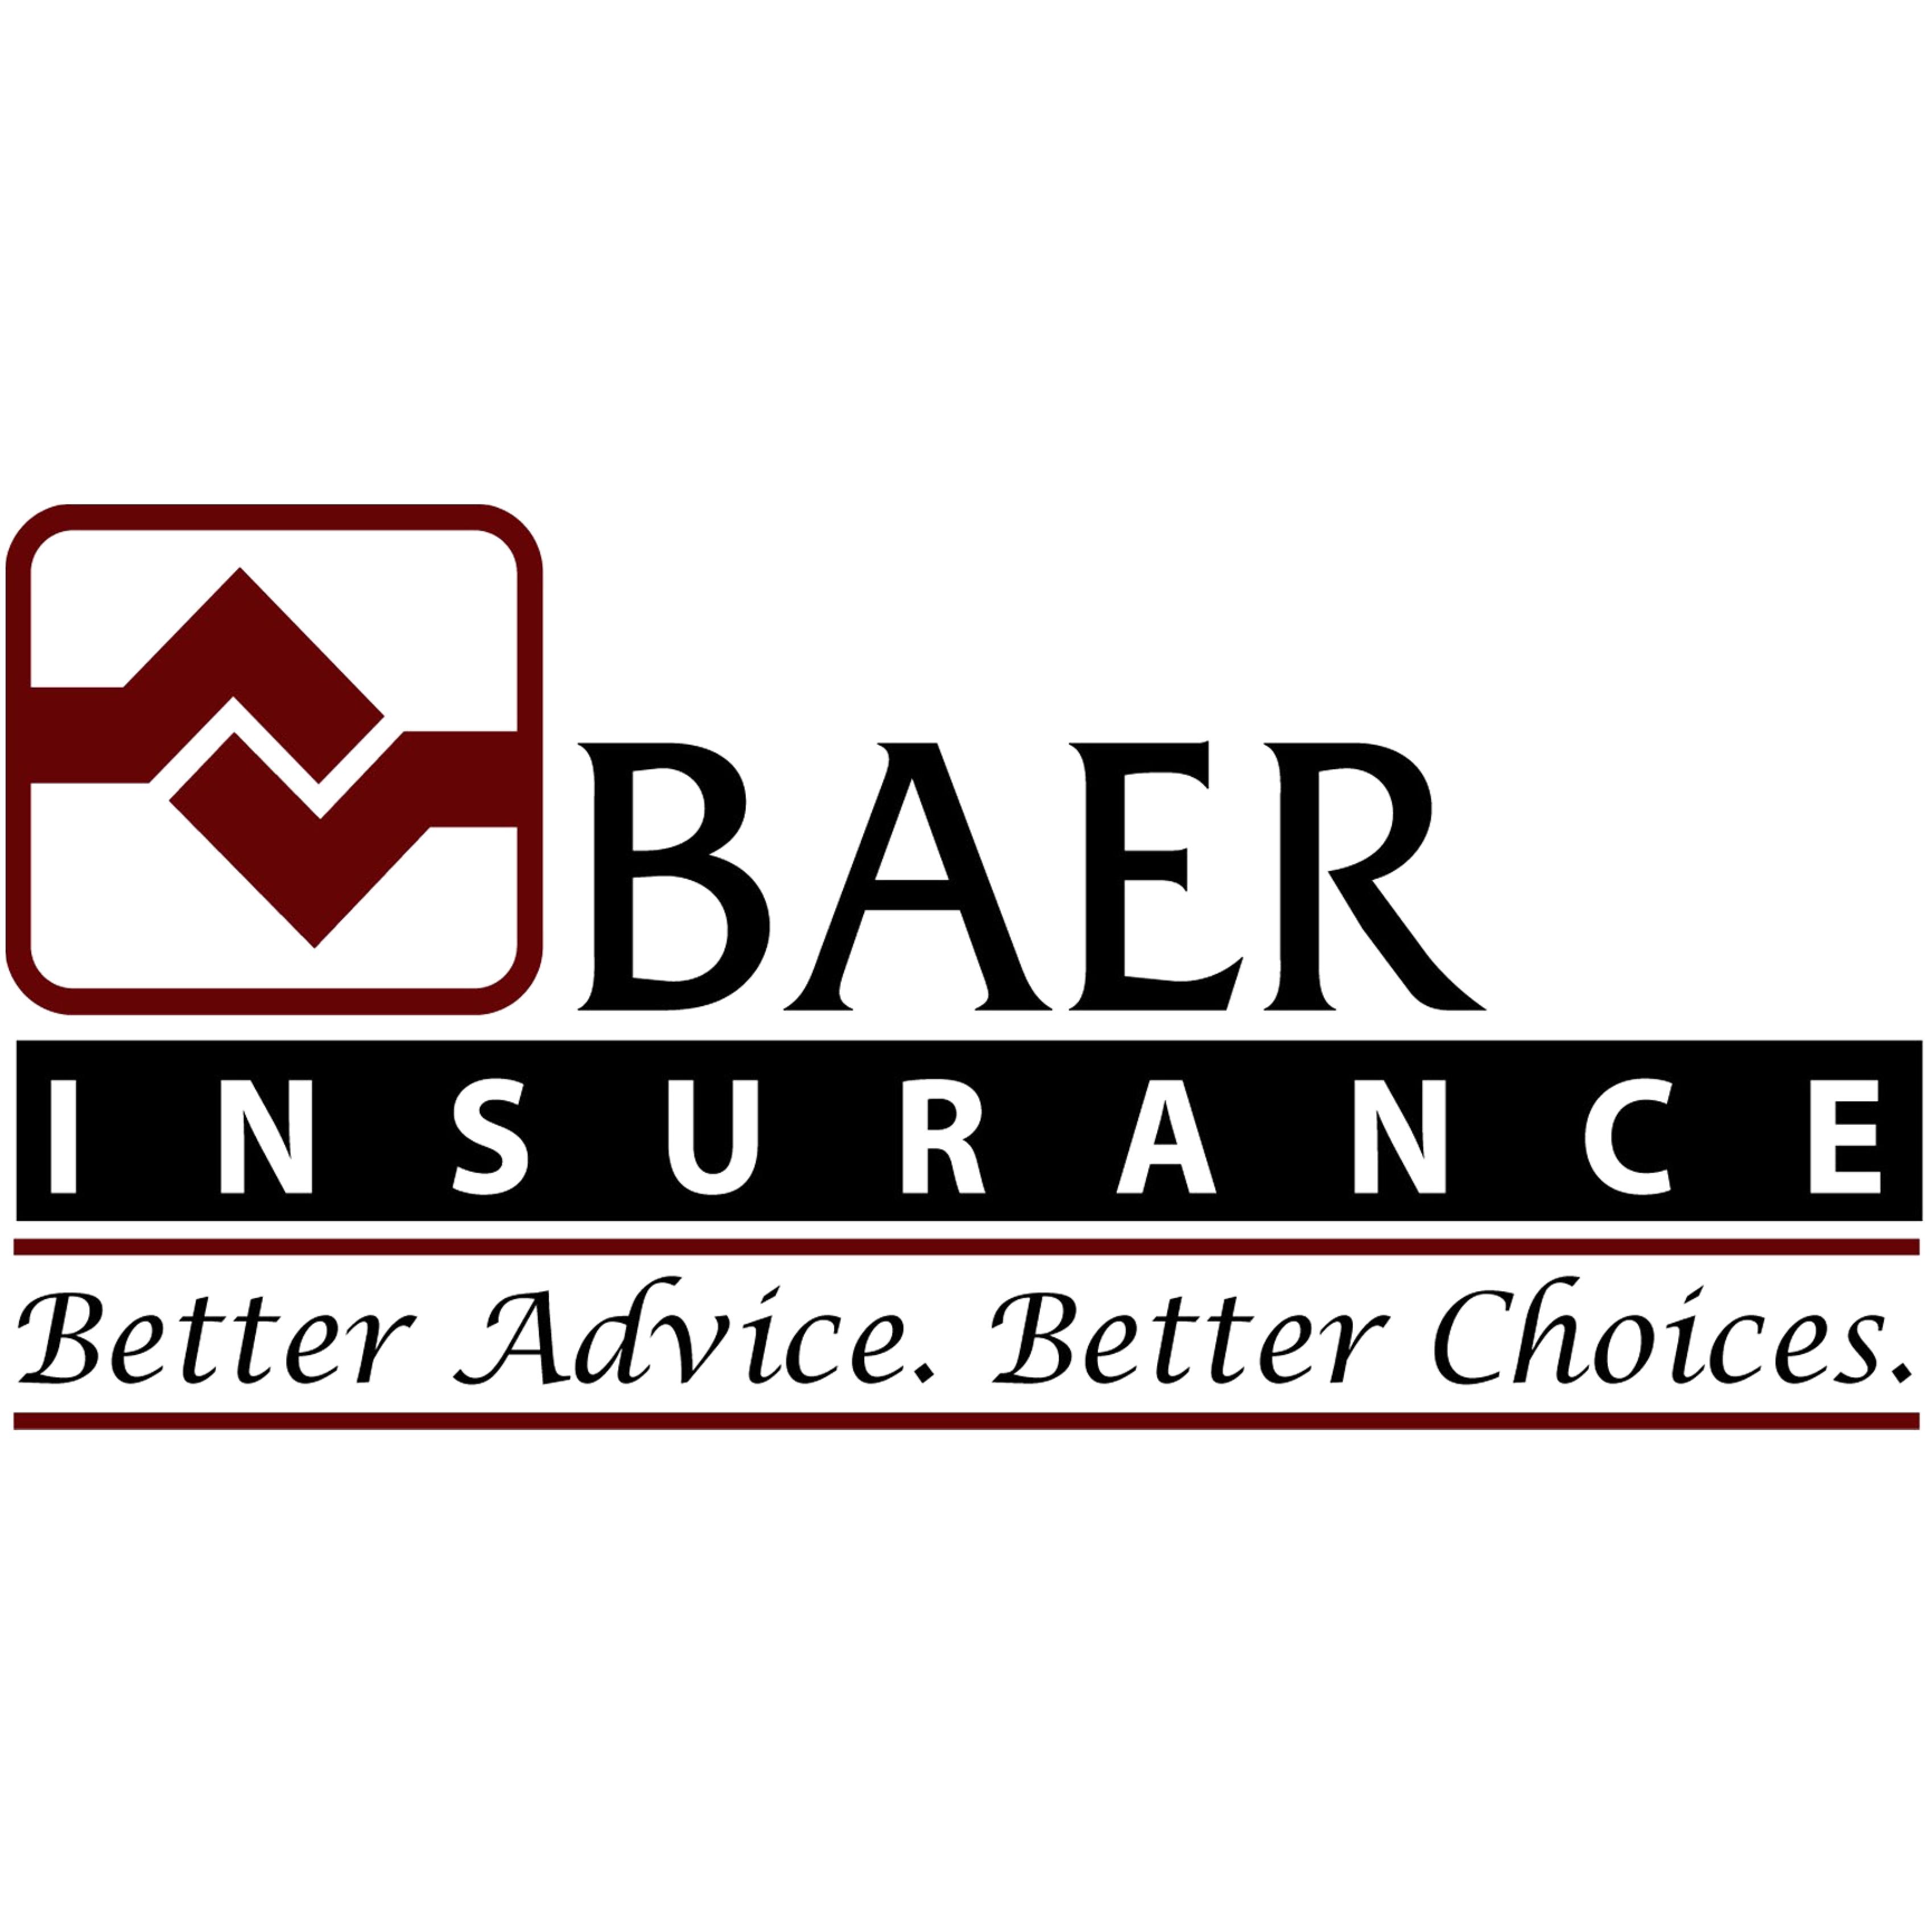 Insurance Companies in Wisconsin & Illinois - Baer Insurance